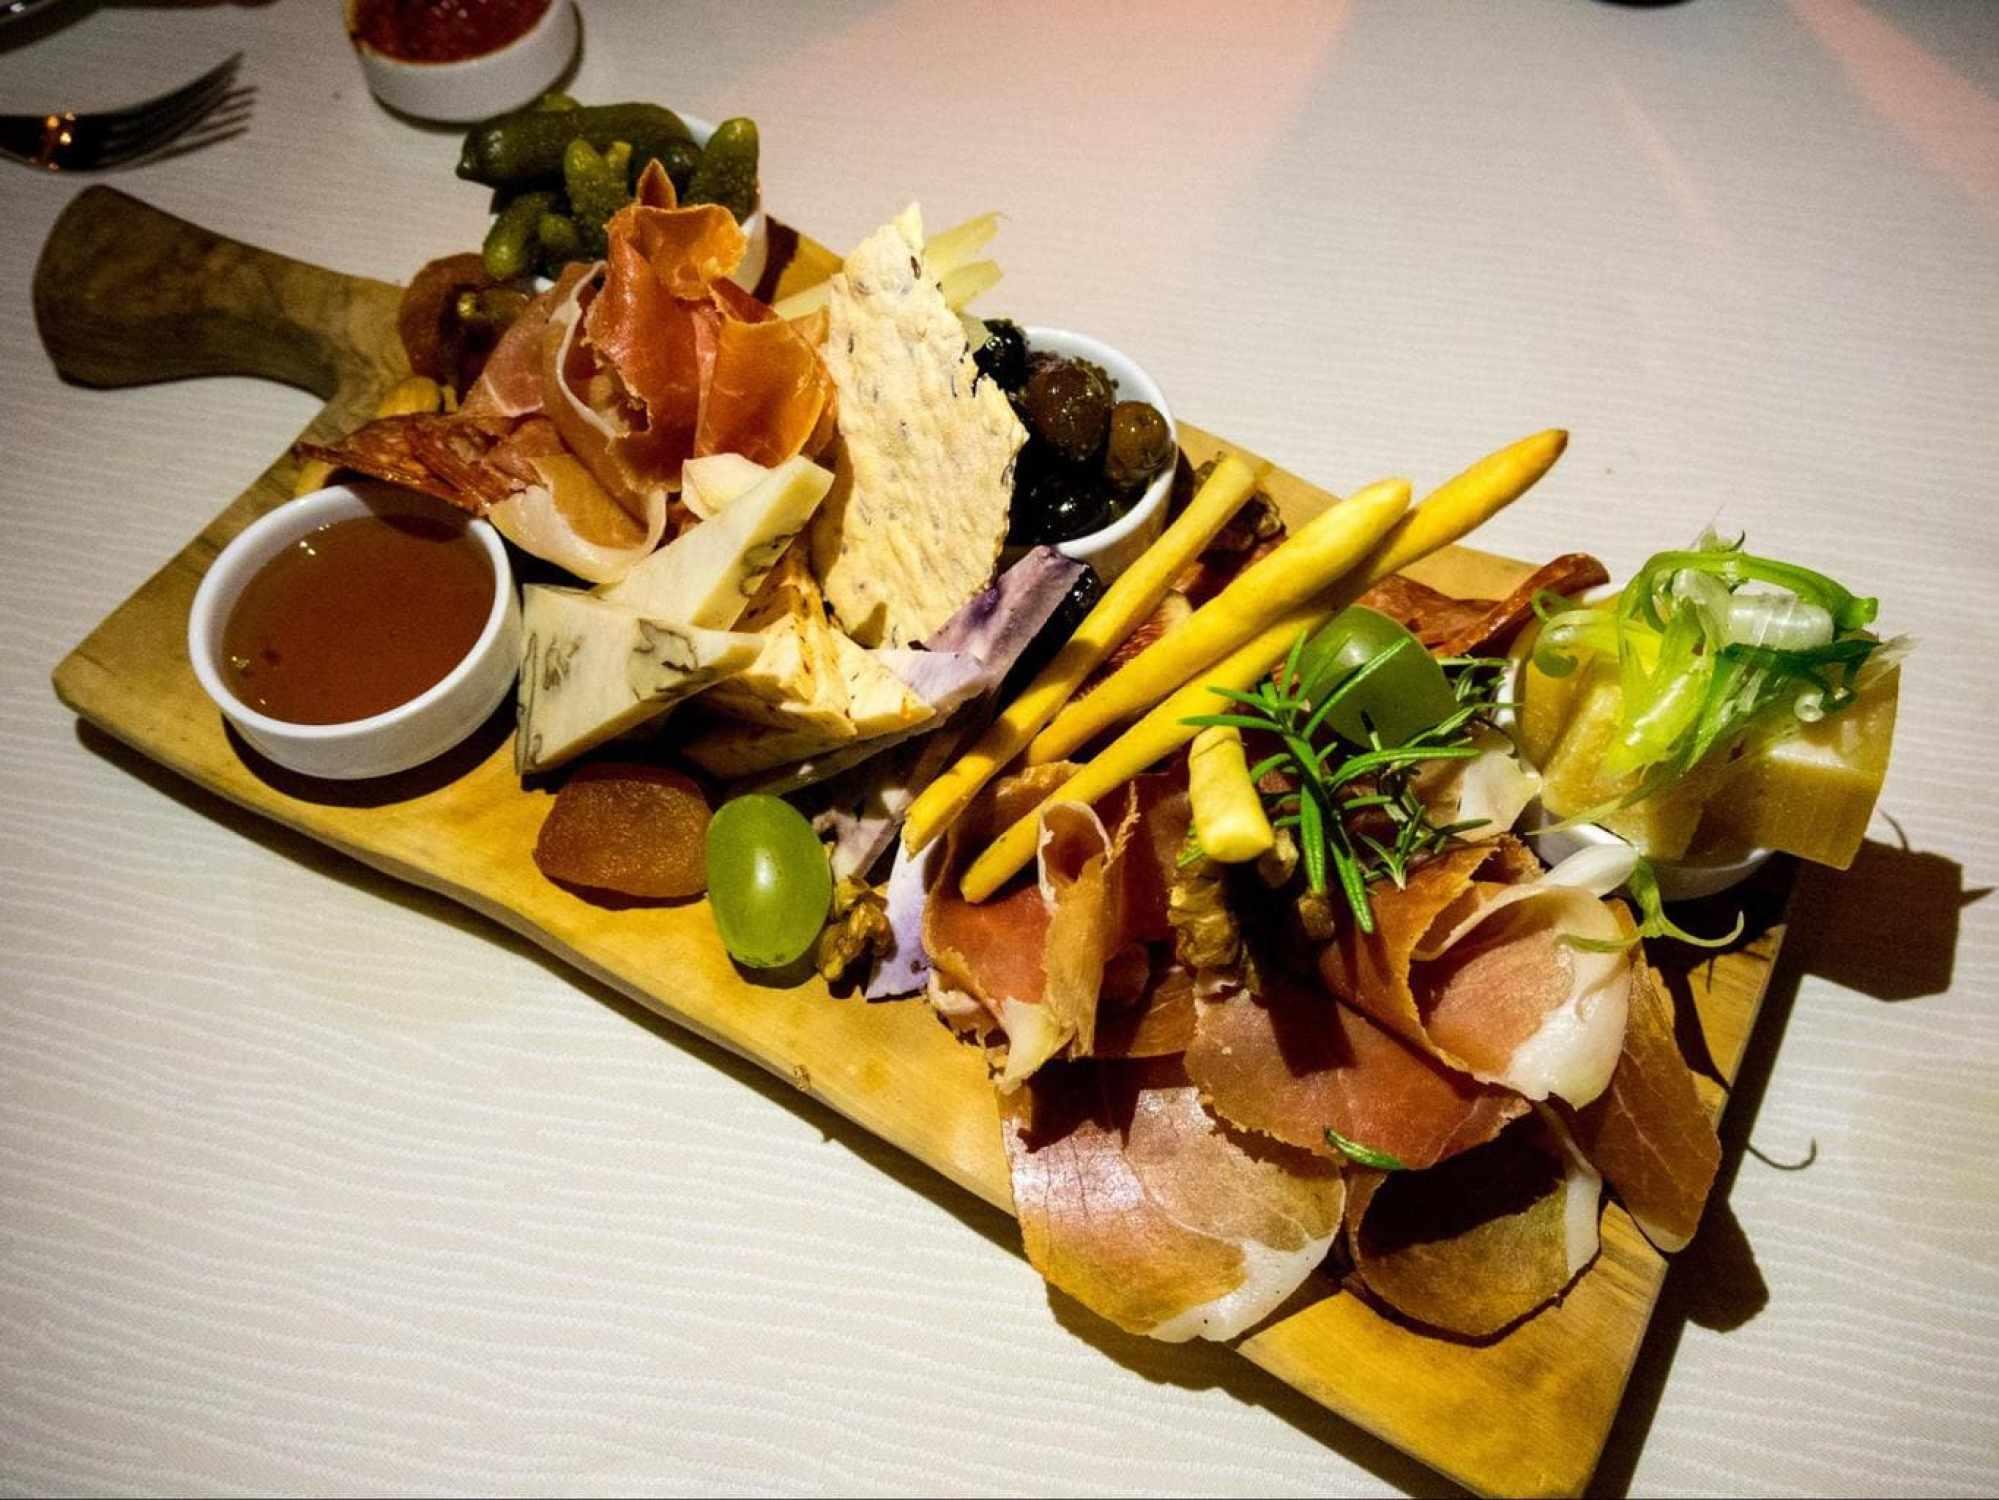 Cheese and ham platter